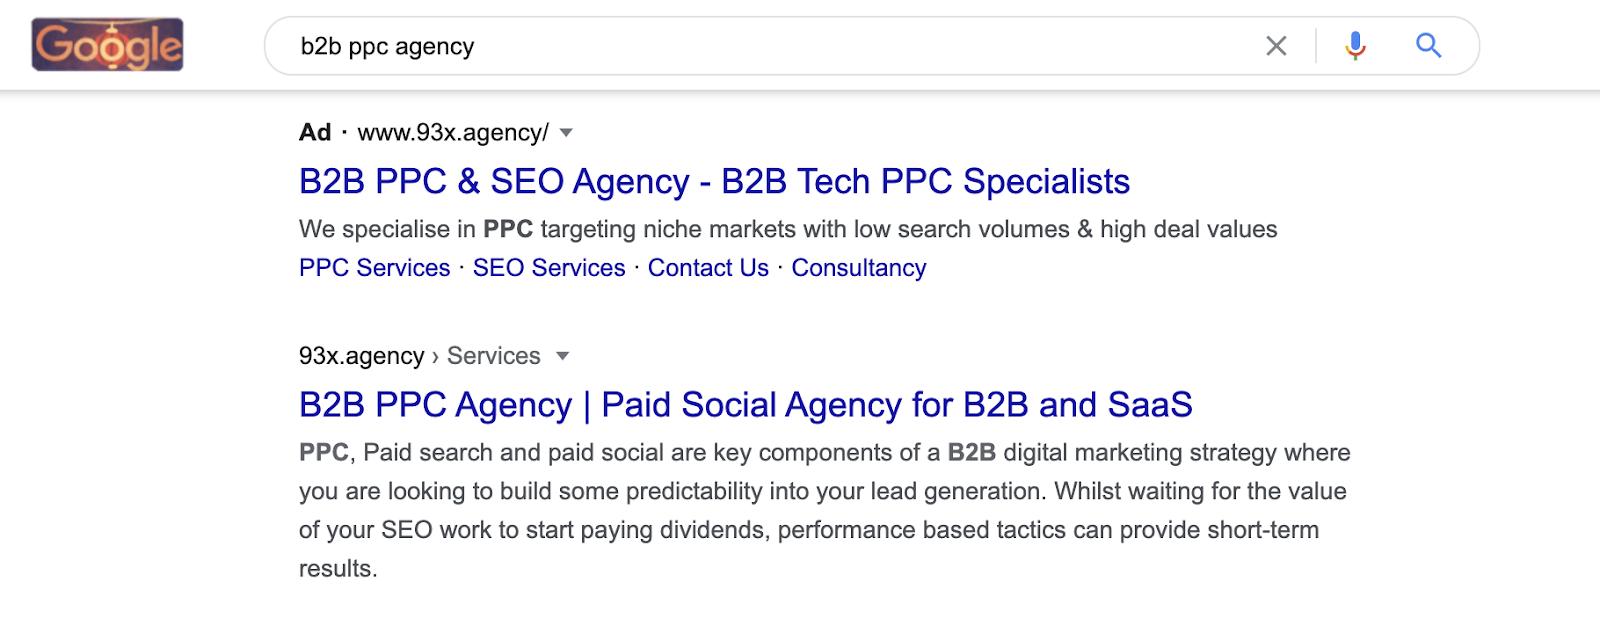 b2b ppc agency screenshor